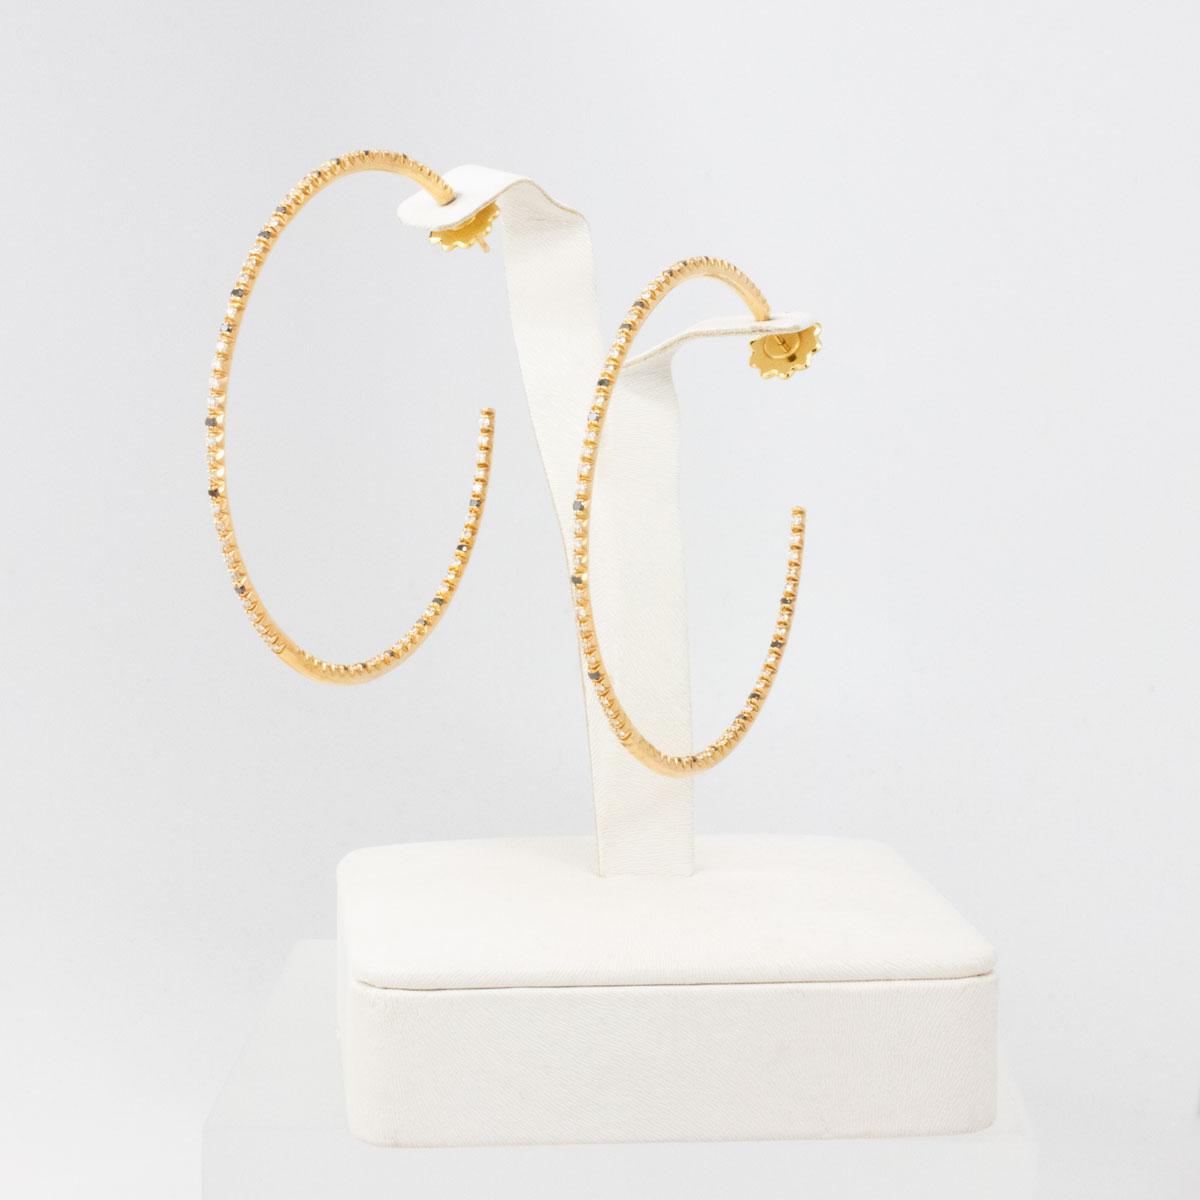 Diamond Hoop Earring with Black Diamond Accents, 18k Yellow Gold